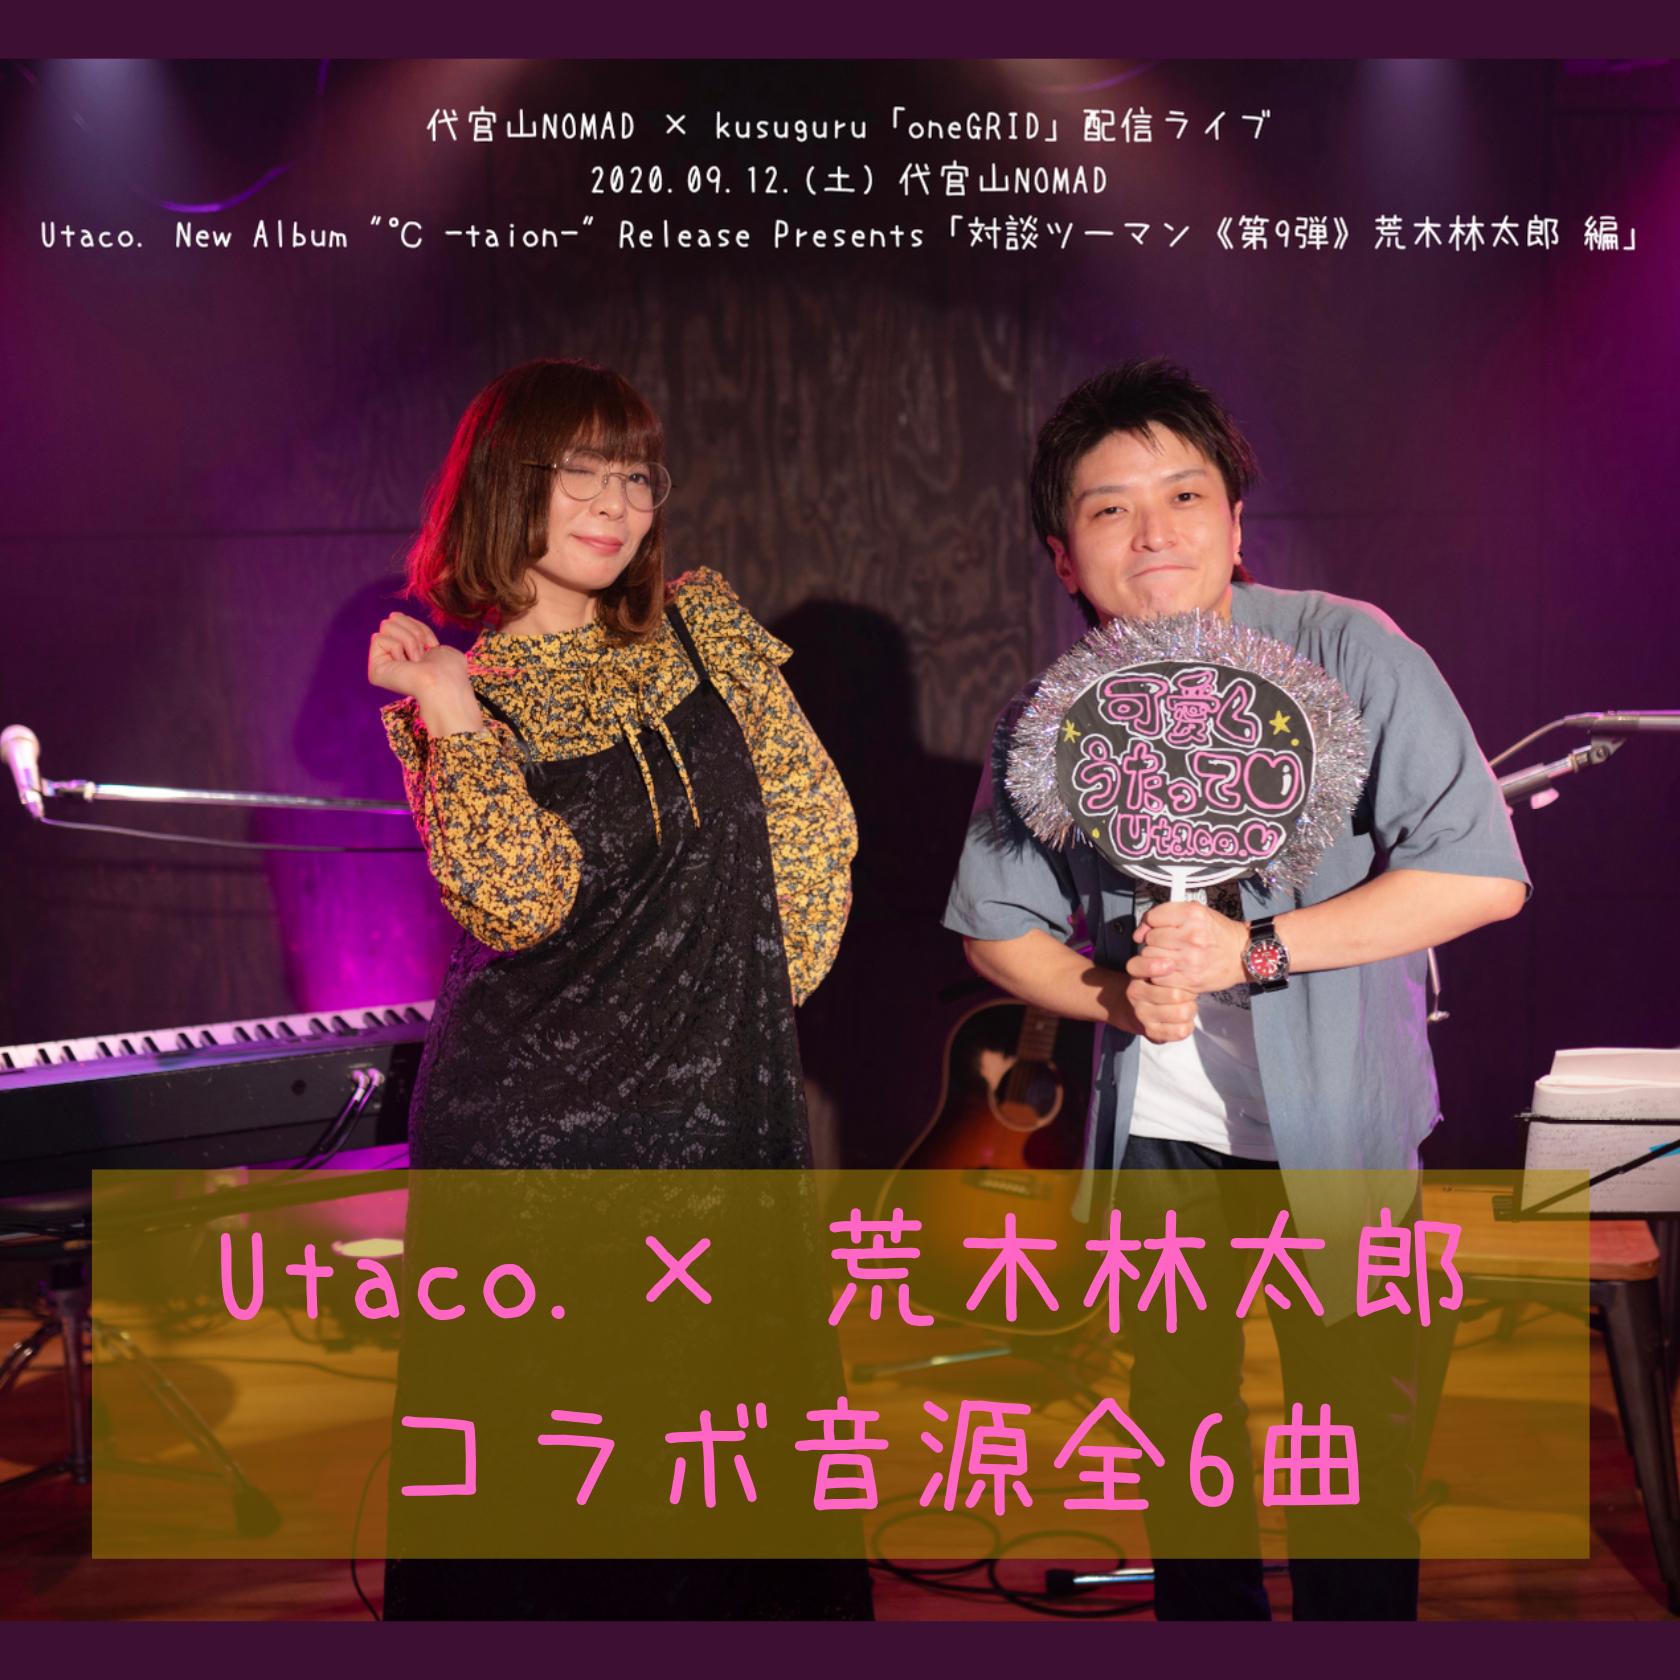 9/12 Utaco. × 荒木林太郎「対談ツーマン」コラボ音源